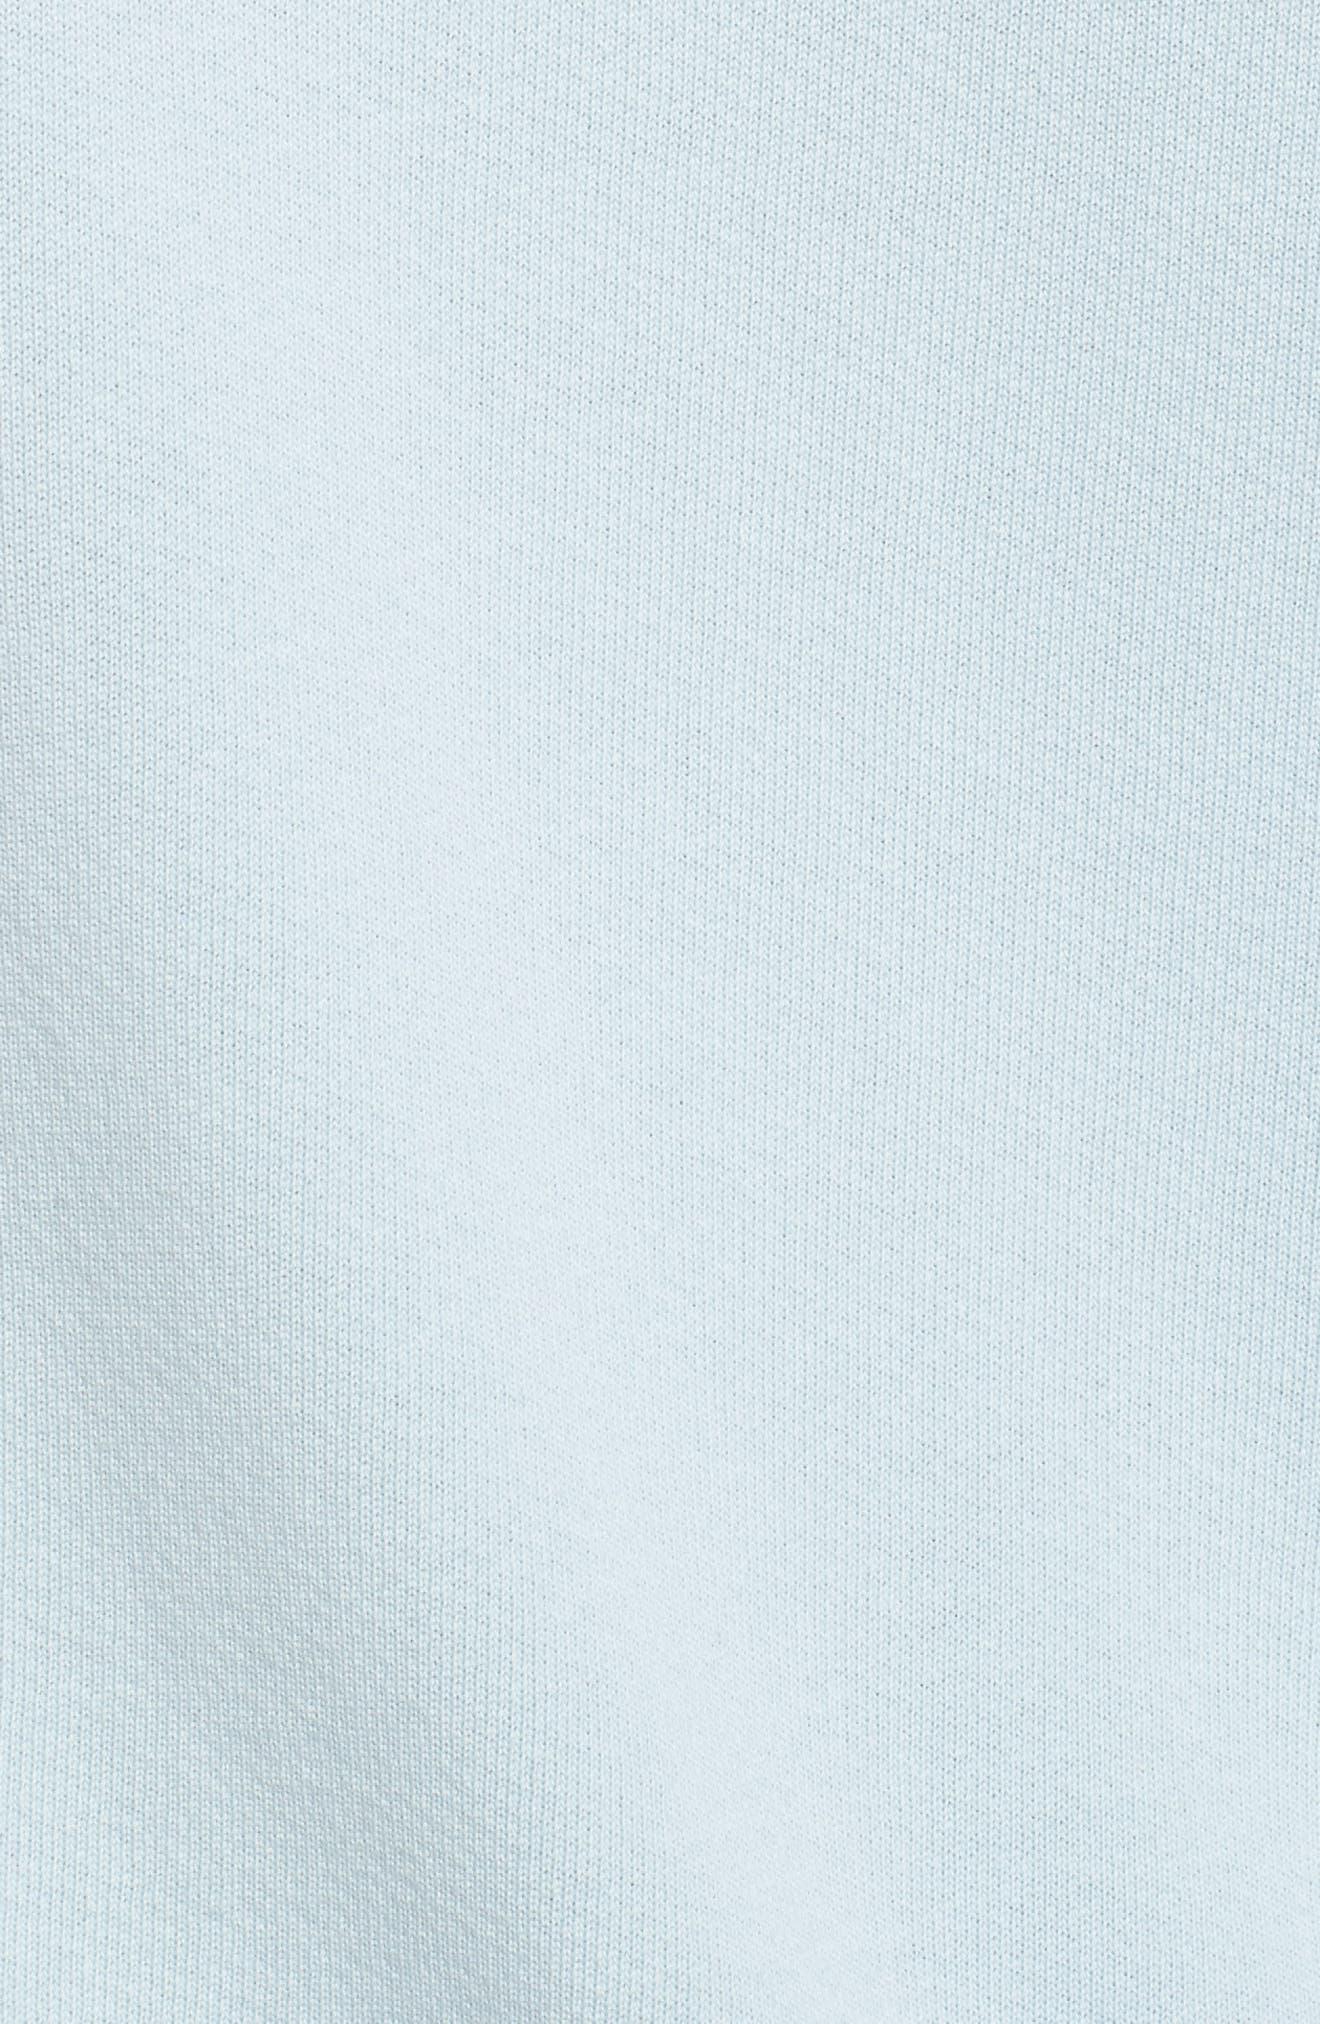 Core Hoodie,                             Alternate thumbnail 5, color,                             Pale Blue W/ White